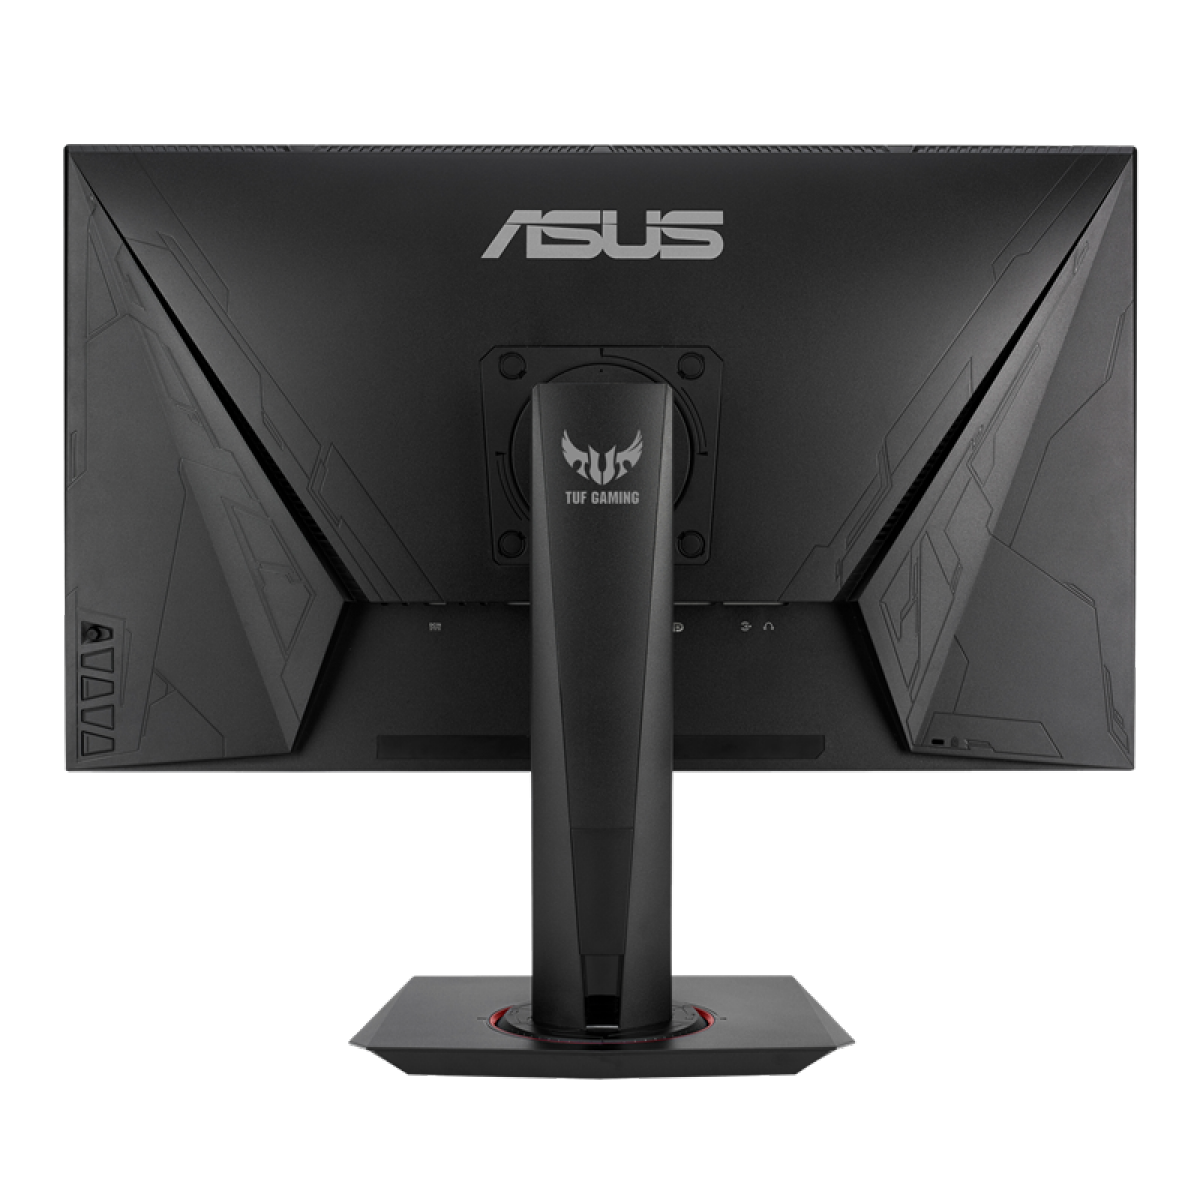 Monitor Gamer ASUS TUF 27 Pol, Full HD, 1ms, IPS, 165Hz, G-Sync, HDMI/DP/DVI, Altura Ajustável, VG279QR